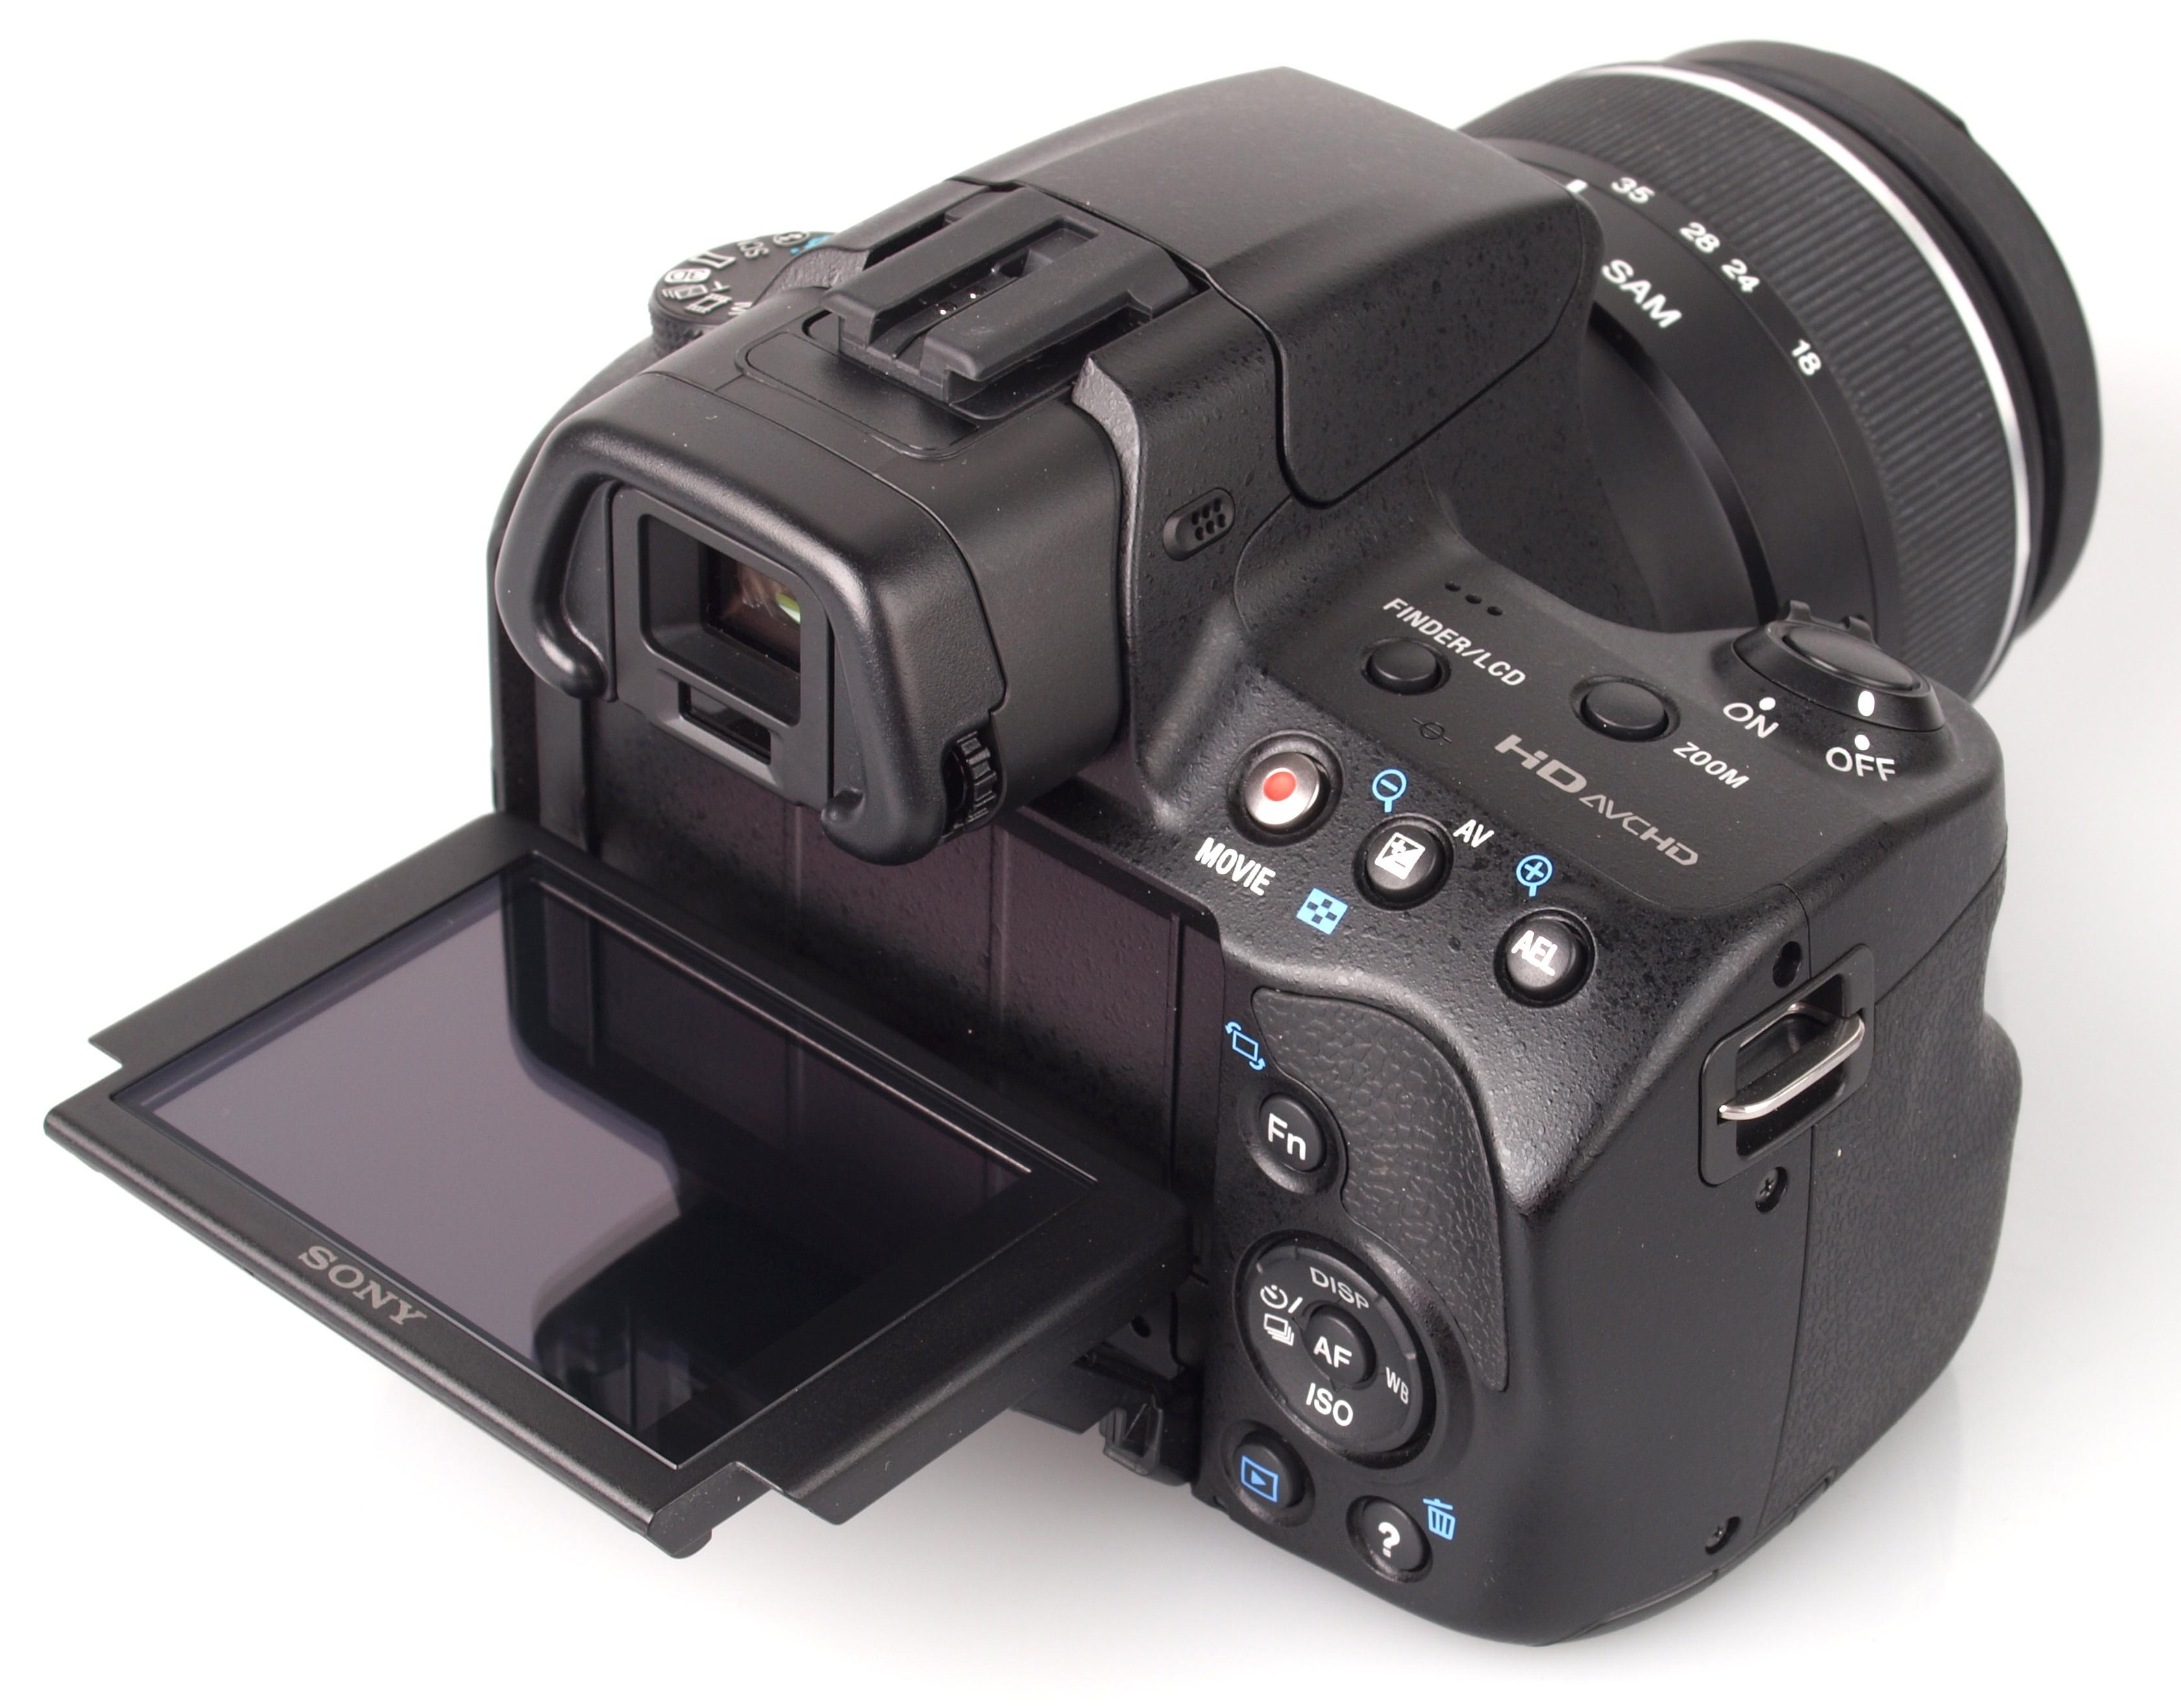 Sony Alpha SLT-A37 — обзор зеркальной фотокамеры: https://hostingkartinok.com/foto/sony-alpha-slt-a37-obzor-zerkalnoy-fotokameryi/